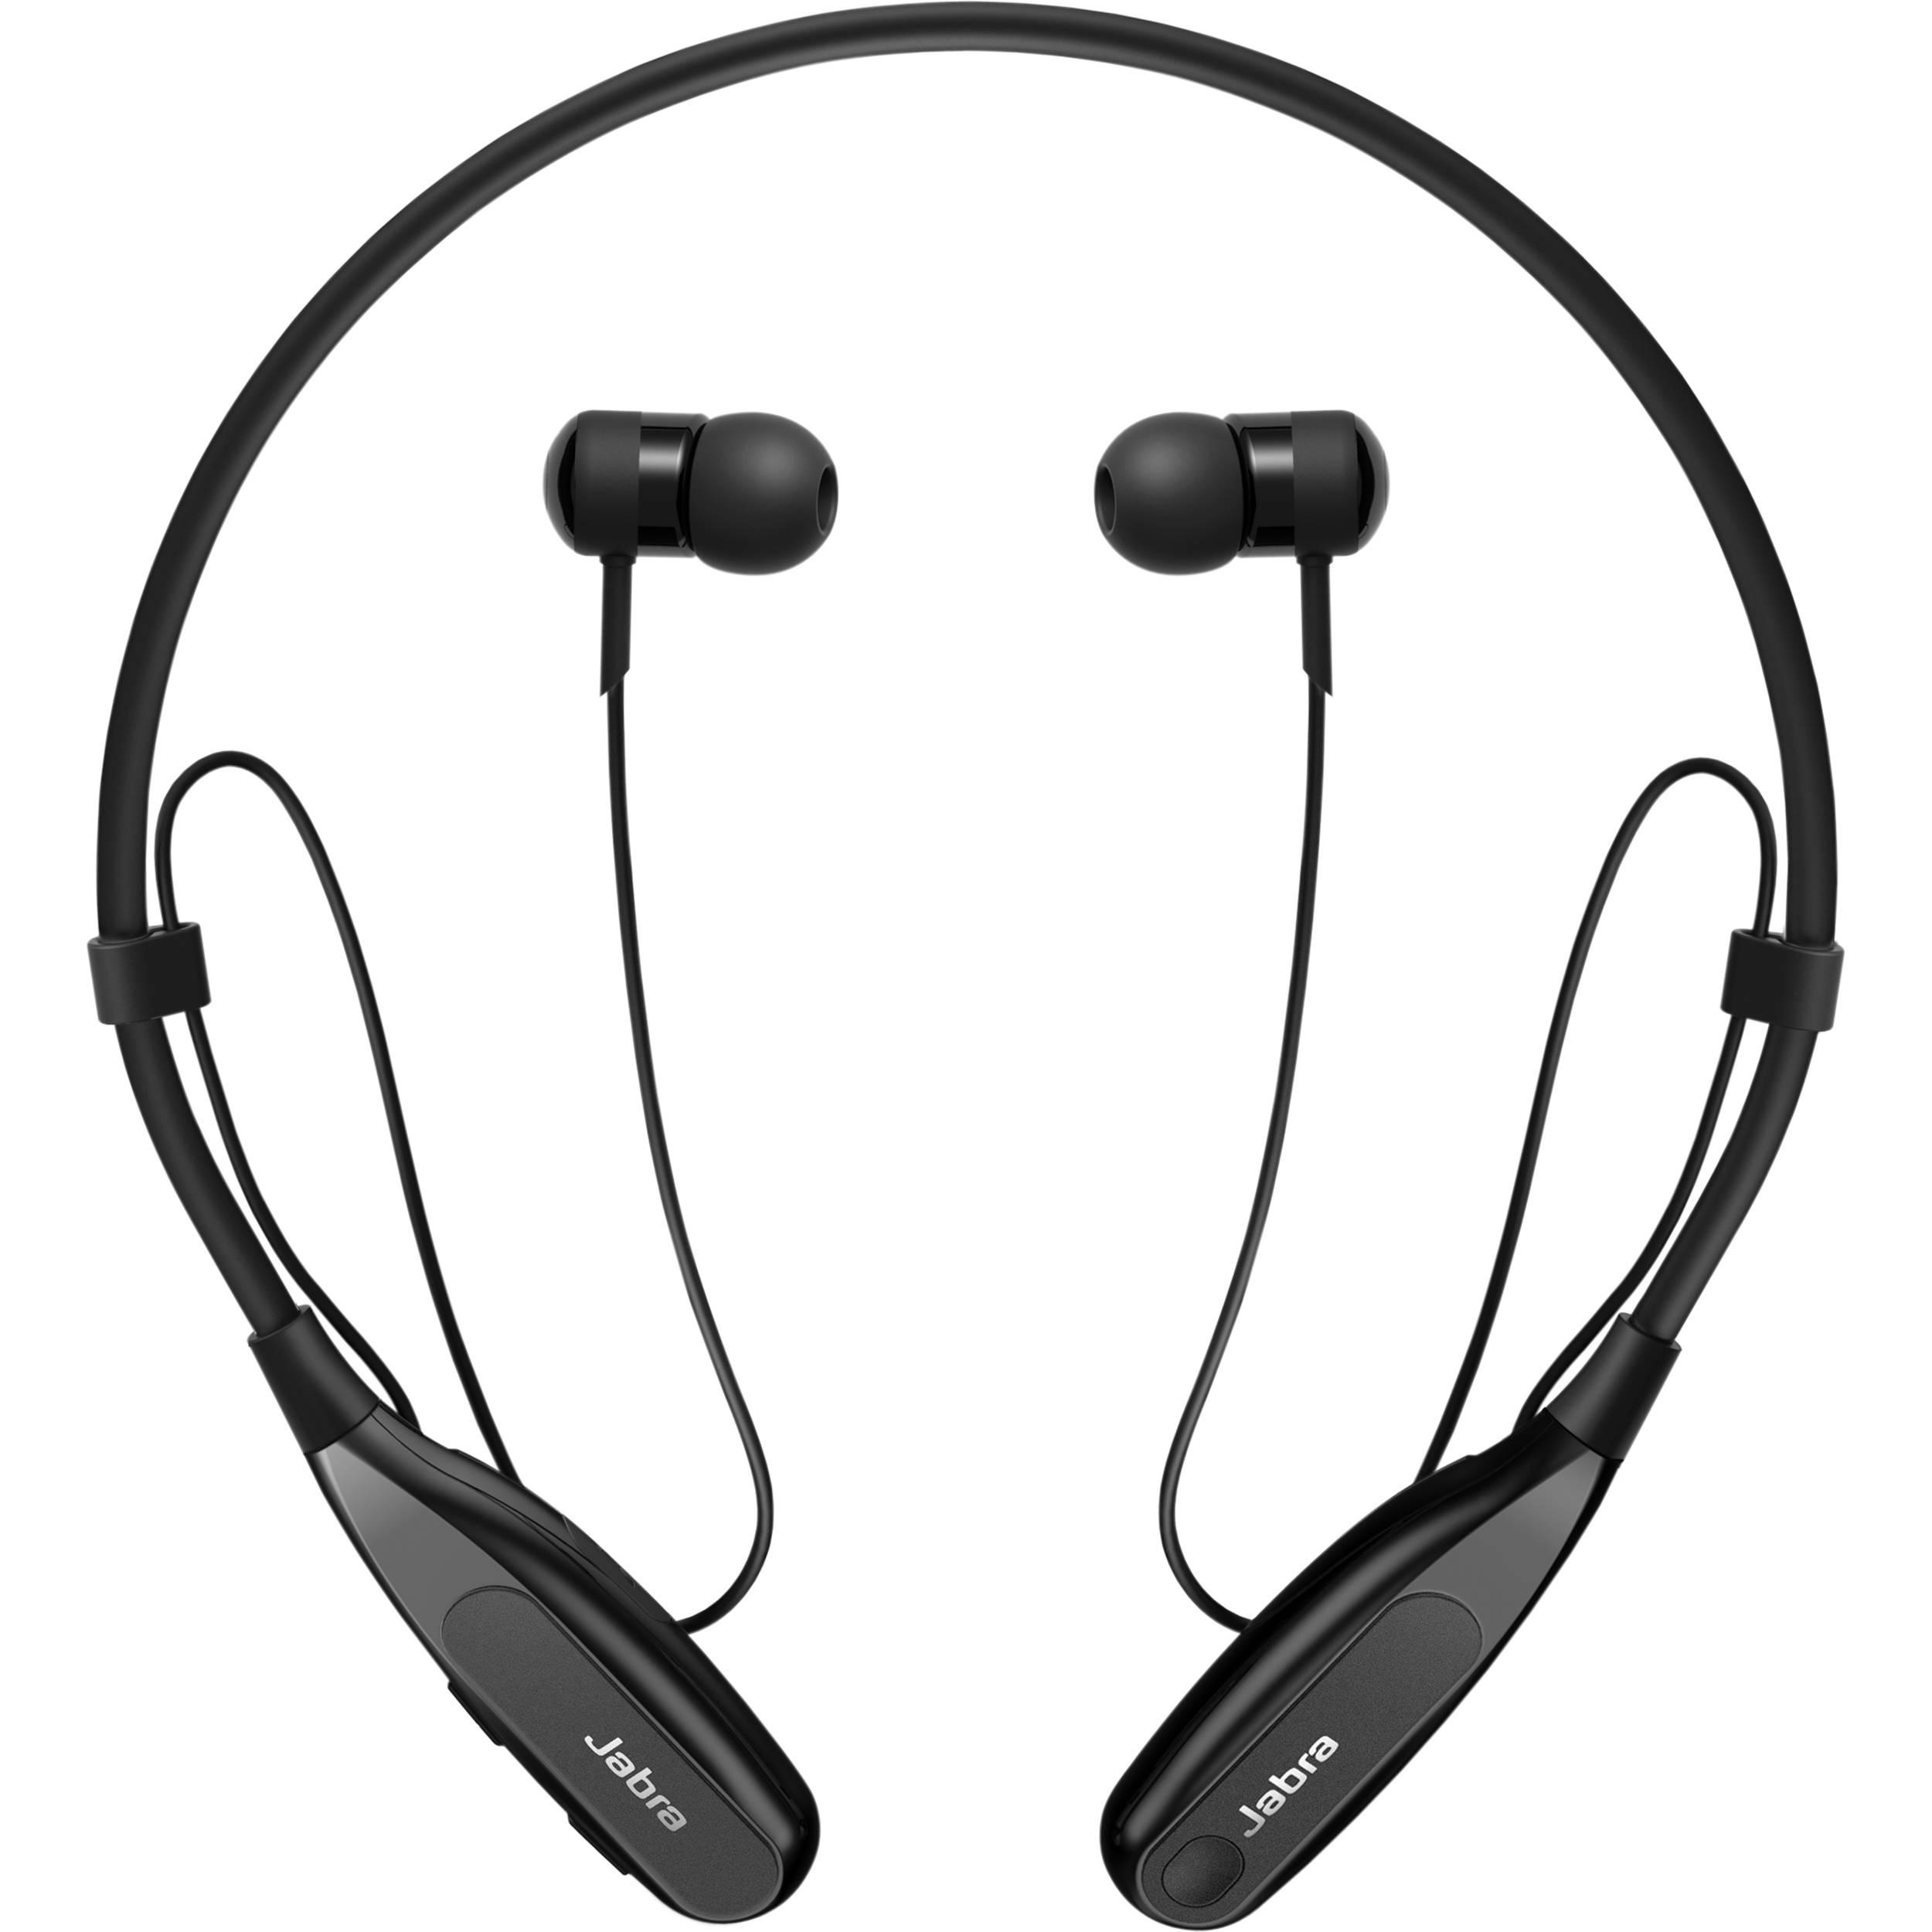 Jabra Halo Fusion Stereo Bluetooth Headset Black